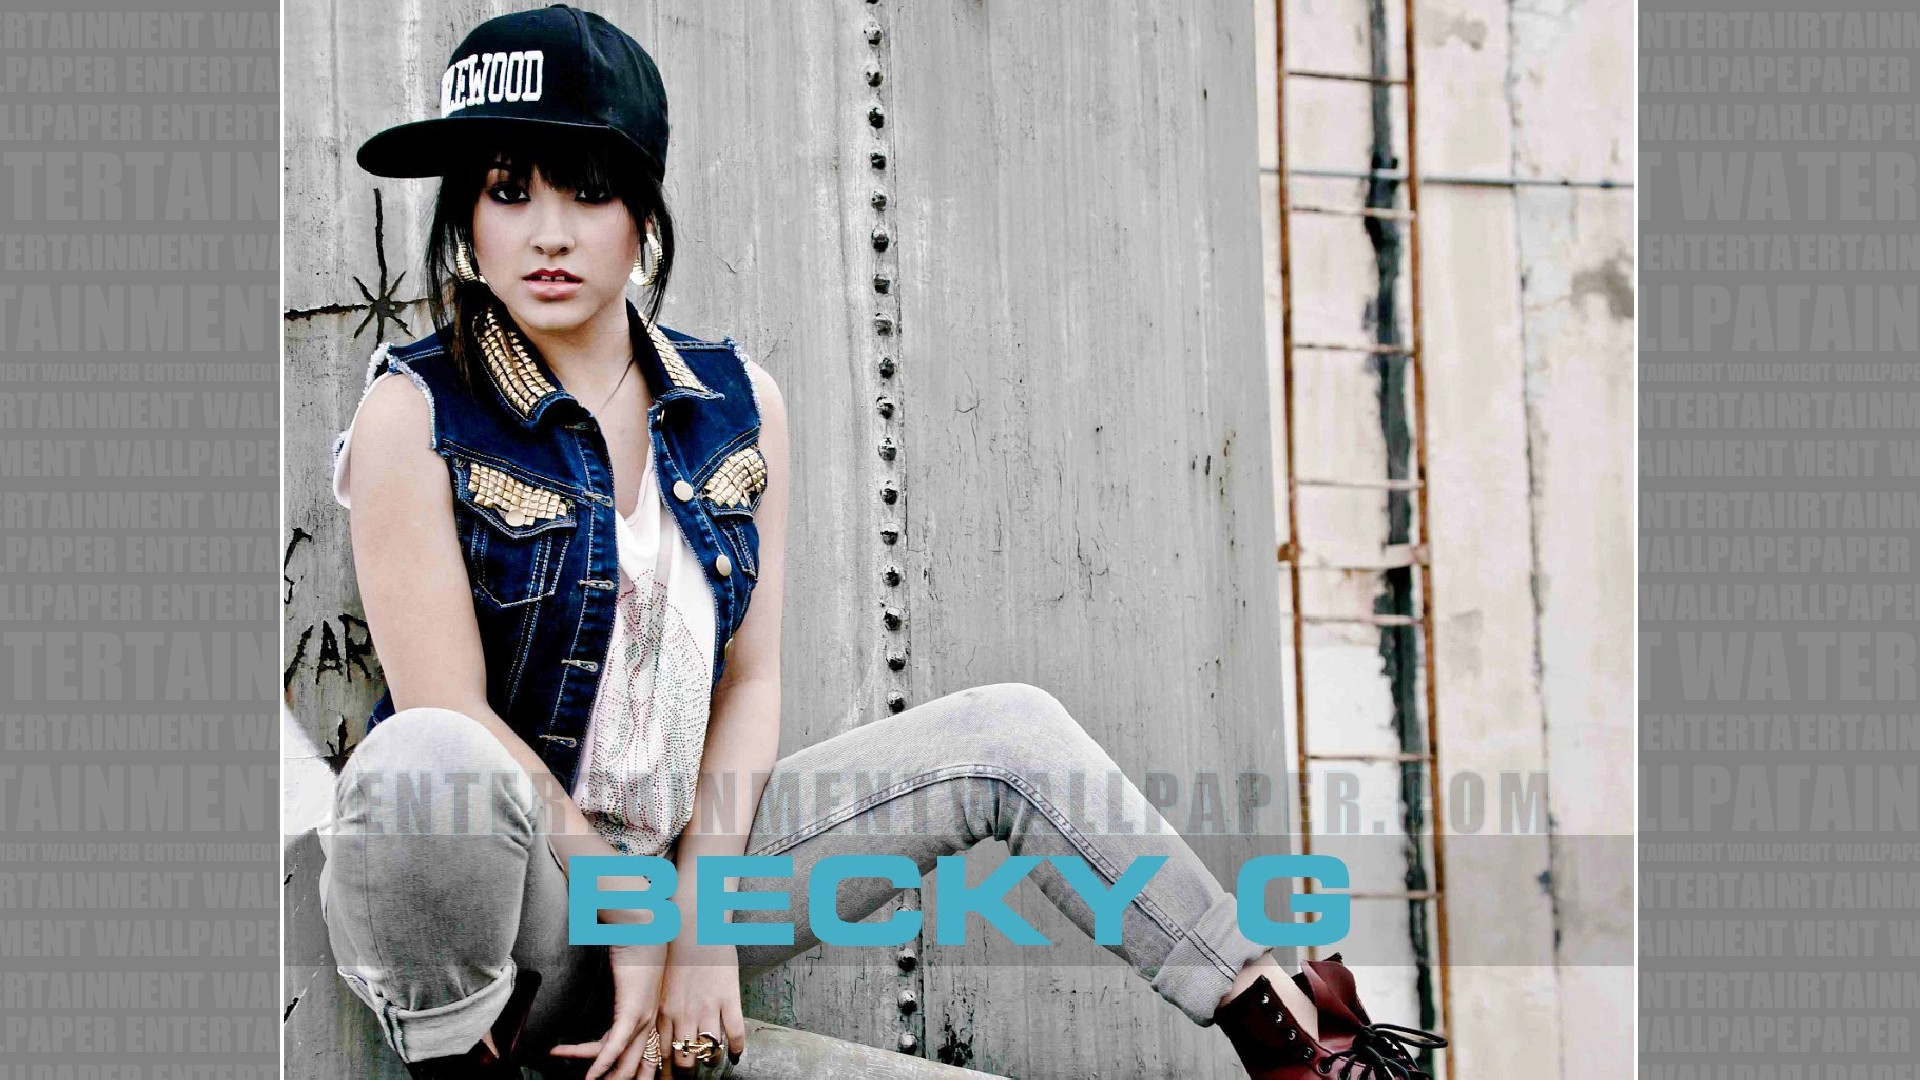 Becky G full hd pics 1920x1080